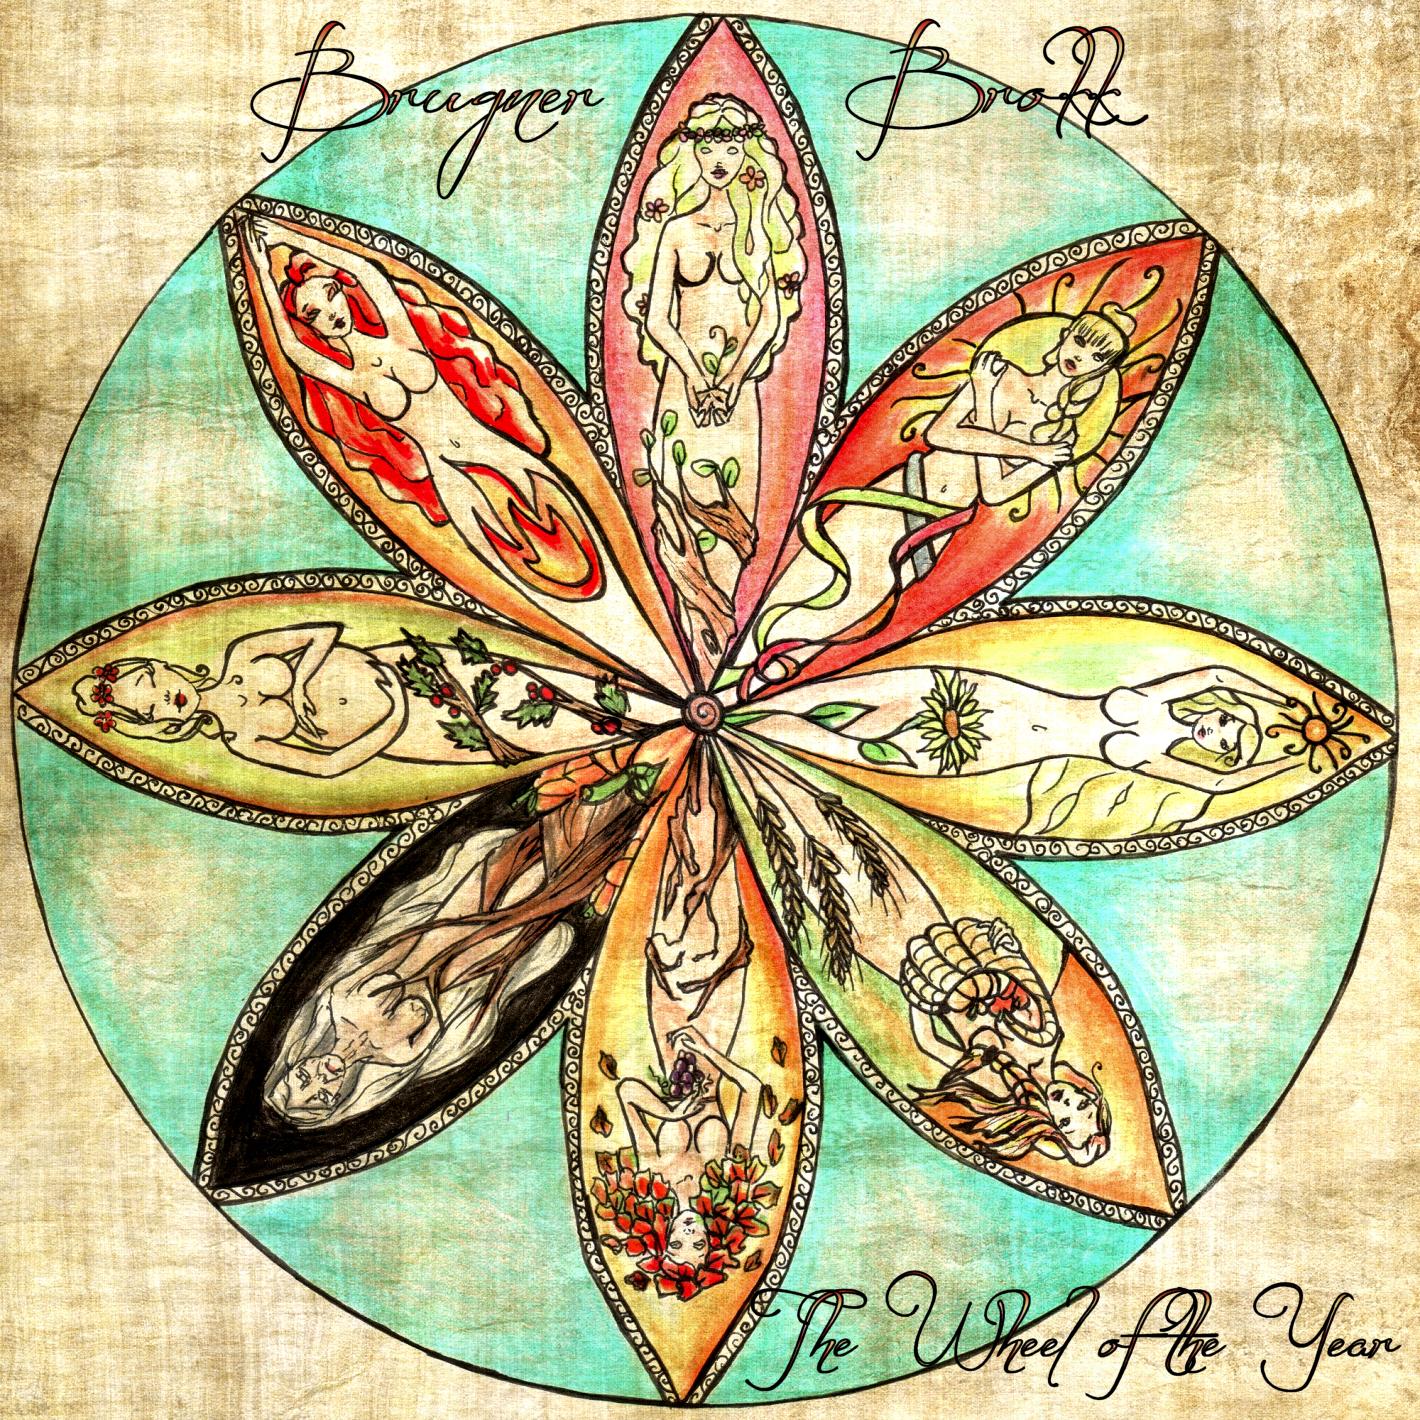 Brugner Brokk - The Wheel of the Year - 2CD digipak